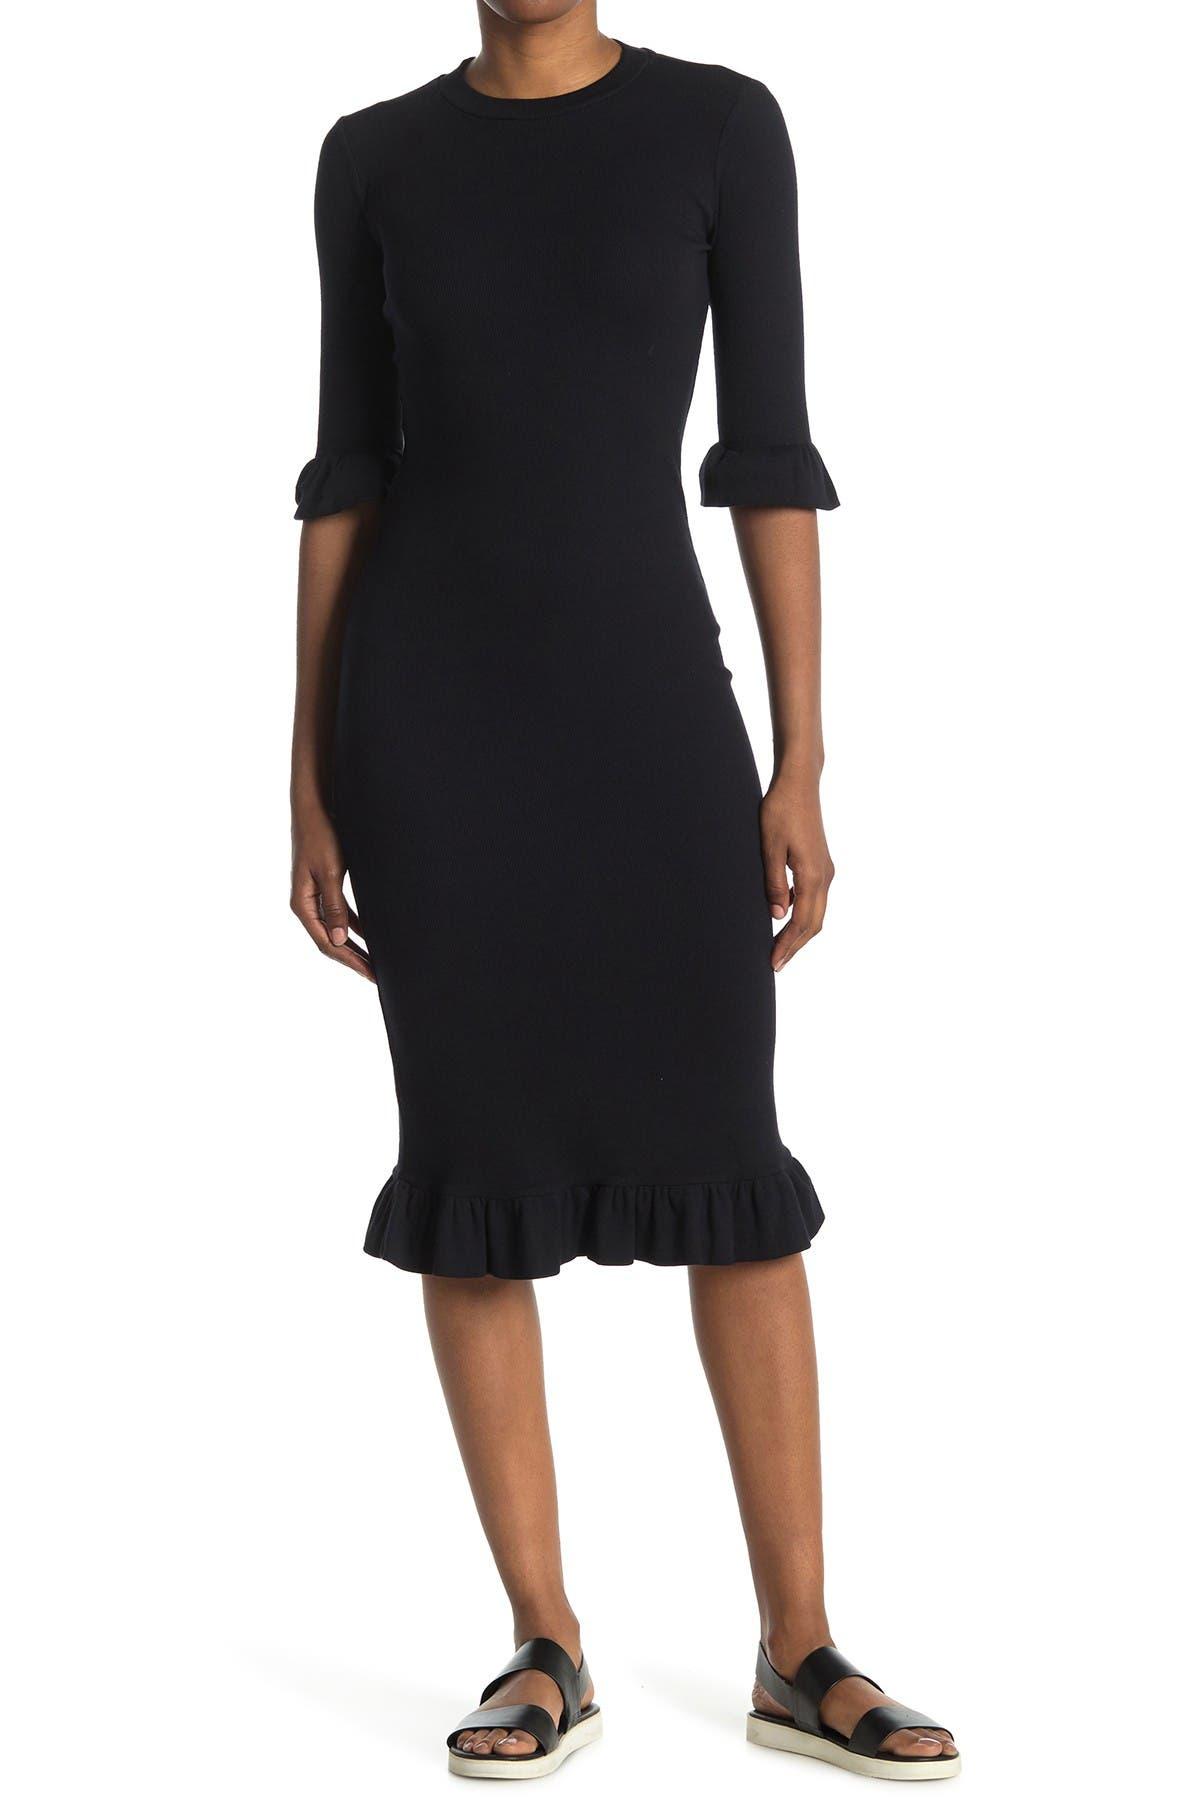 Image of Stateside Mini Rib Ruffle Midi Dress